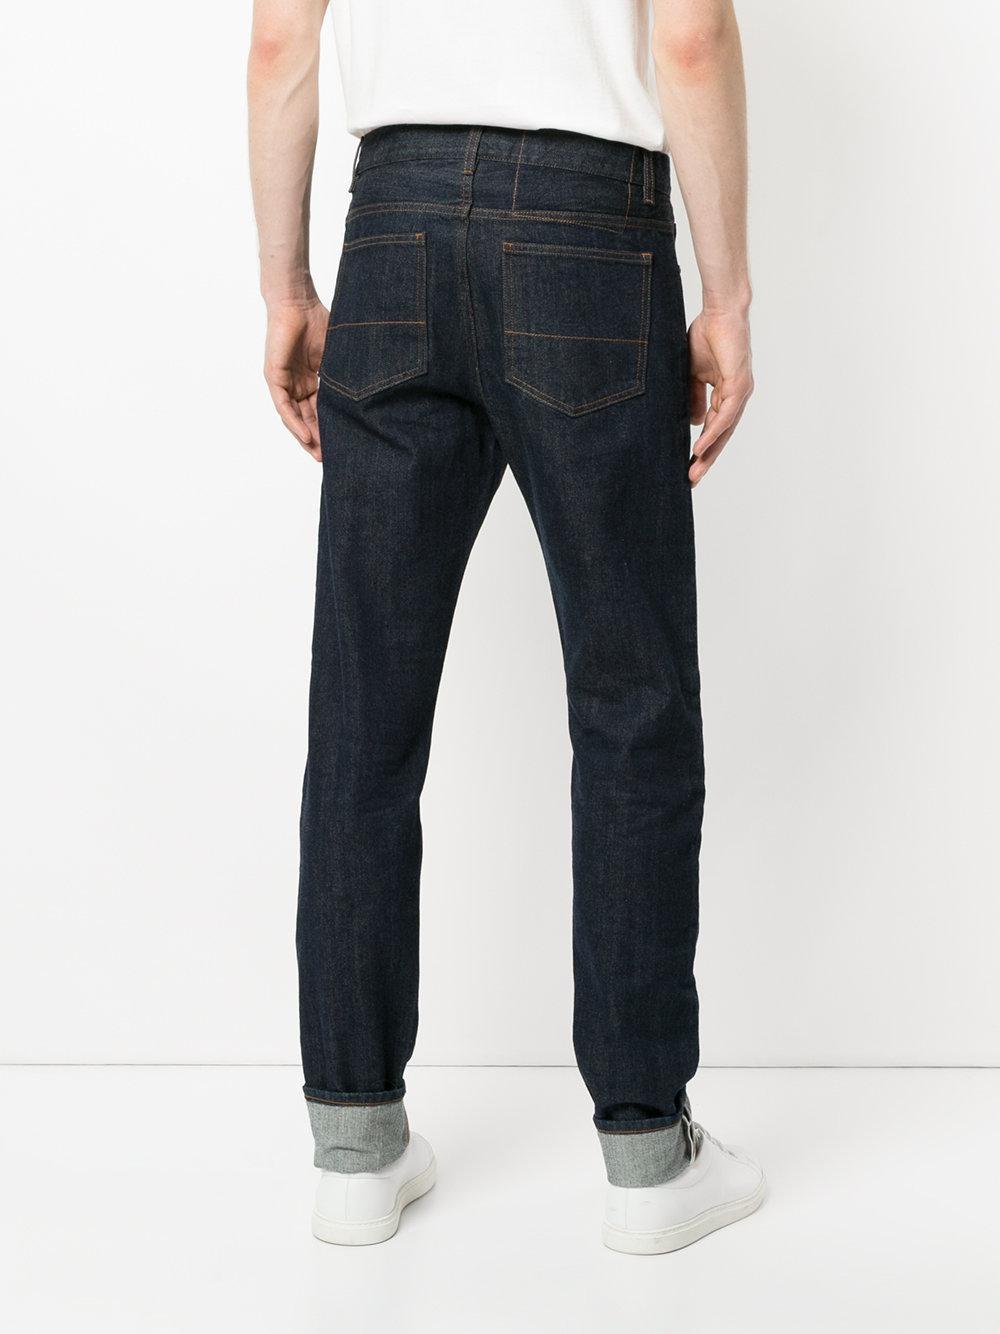 Kent & Curwen Denim Tapered Leg Jeans in Blue for Men